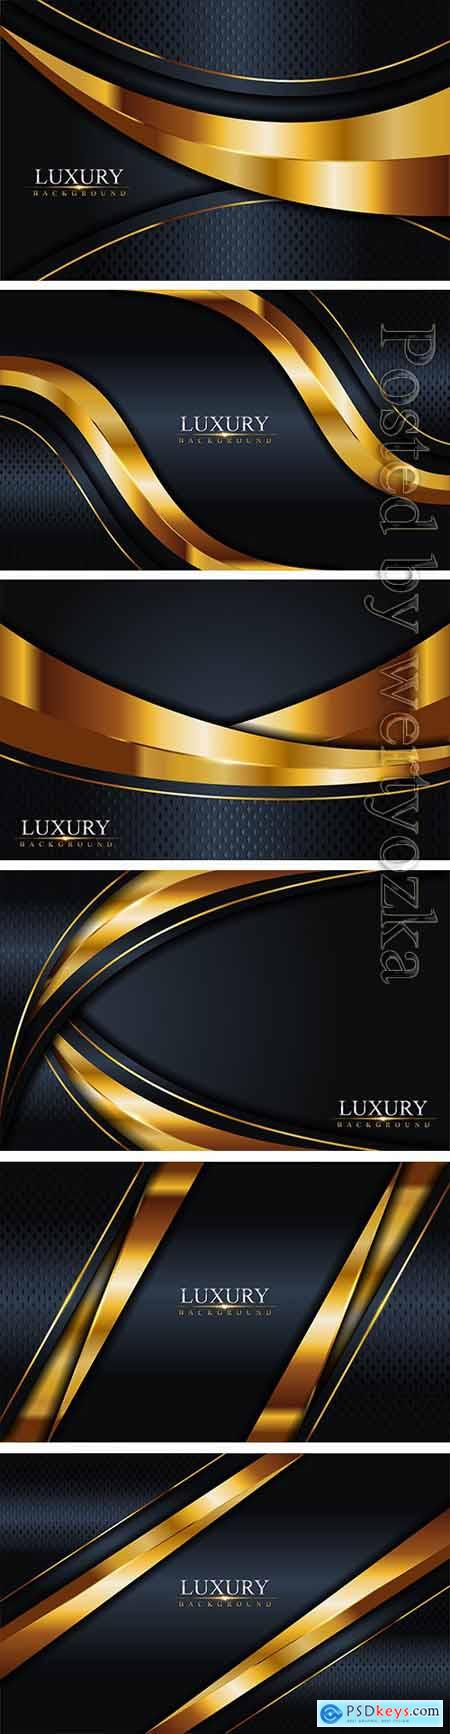 Luxury dark navy combination with golden lines background, graphic element vector